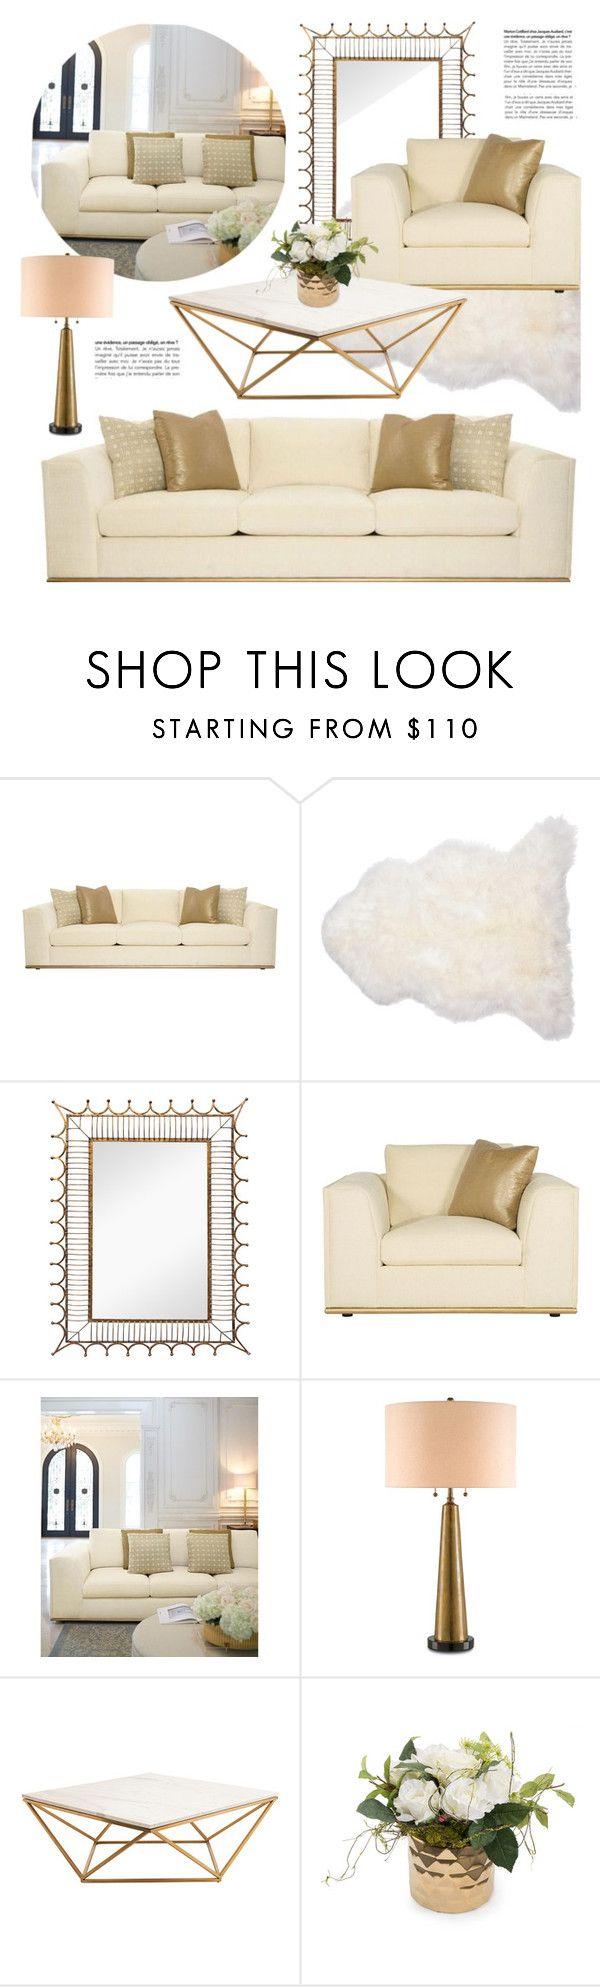 Glamorous Living Room | Pinterest | Interior decorating, Living ...